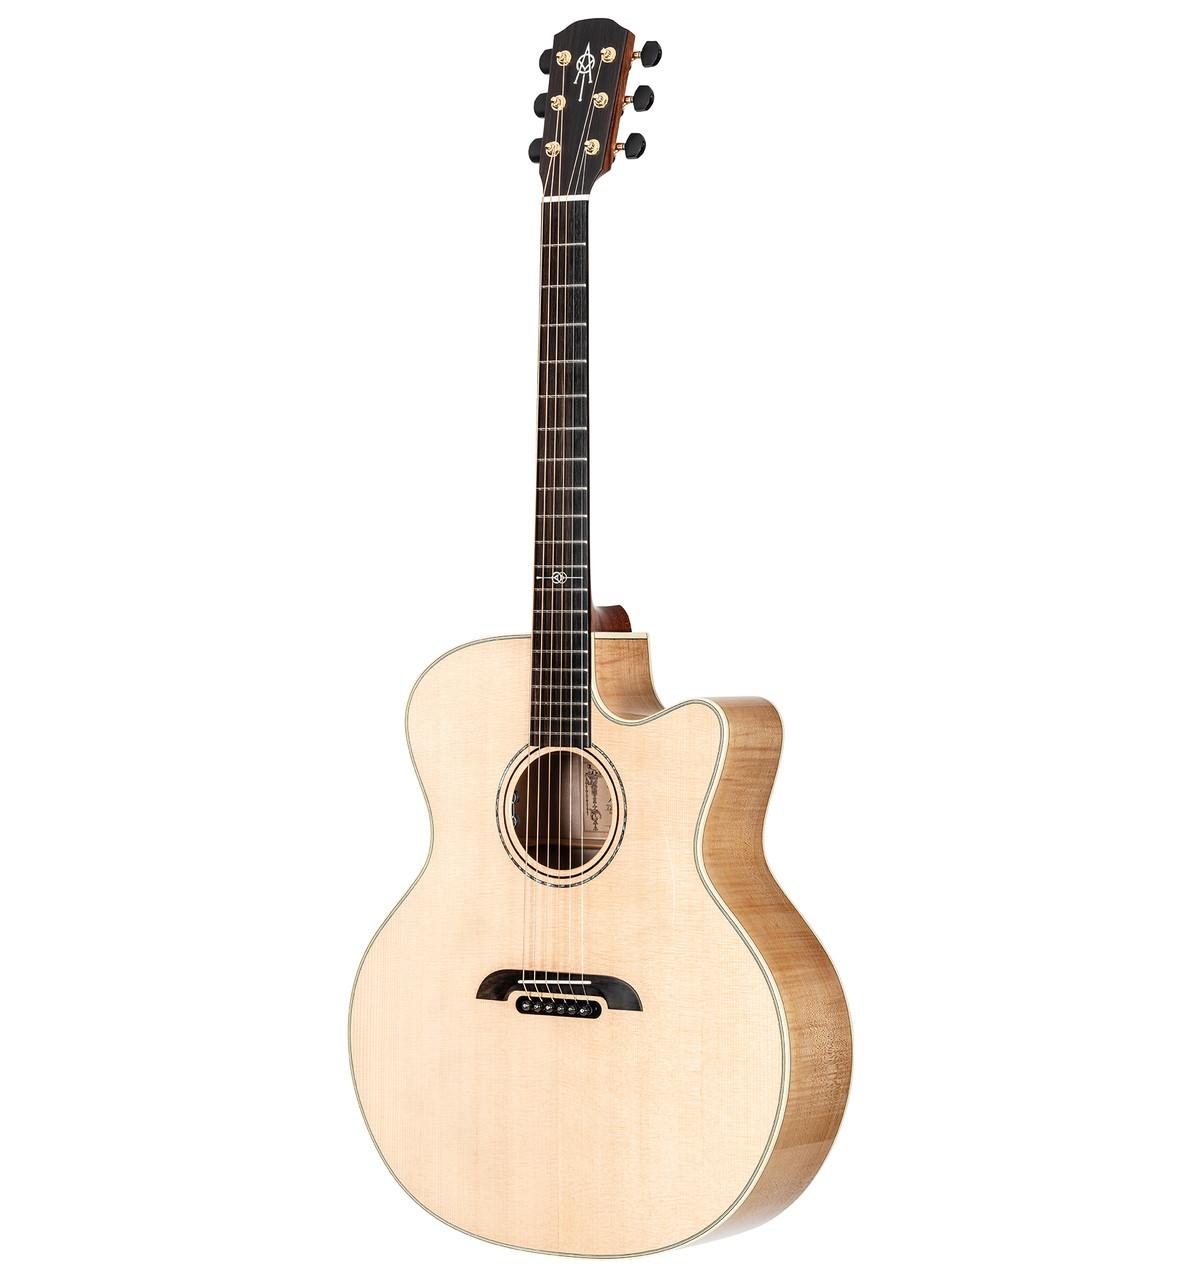 Alvarez Yairi JYM80CE Masterworks Jumbo Acoustic Guitar